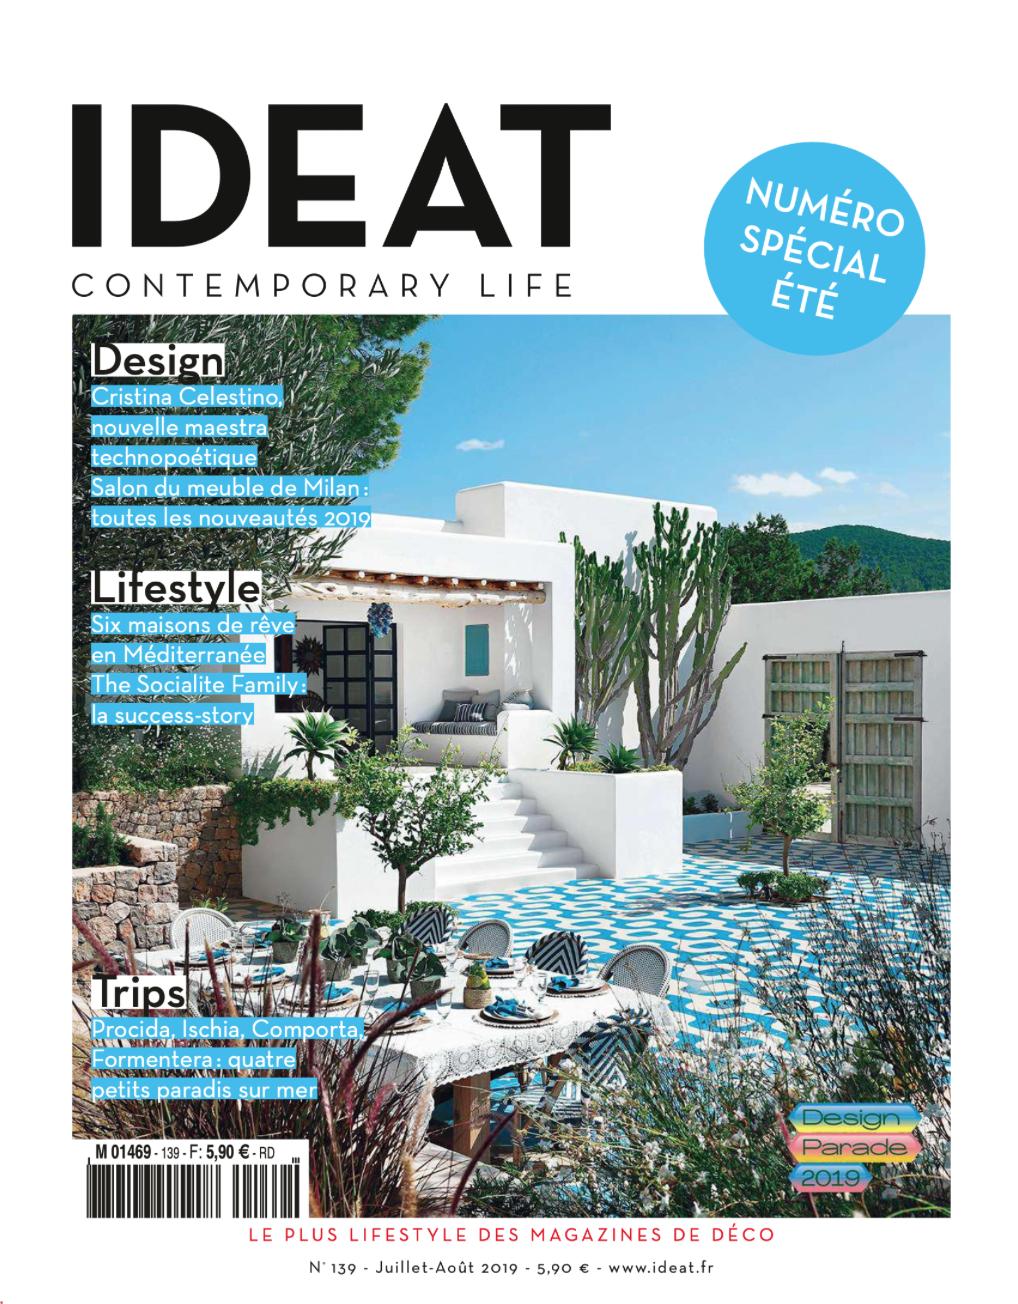 Ideat magazine - 3 Juillet 2019 (1/5)